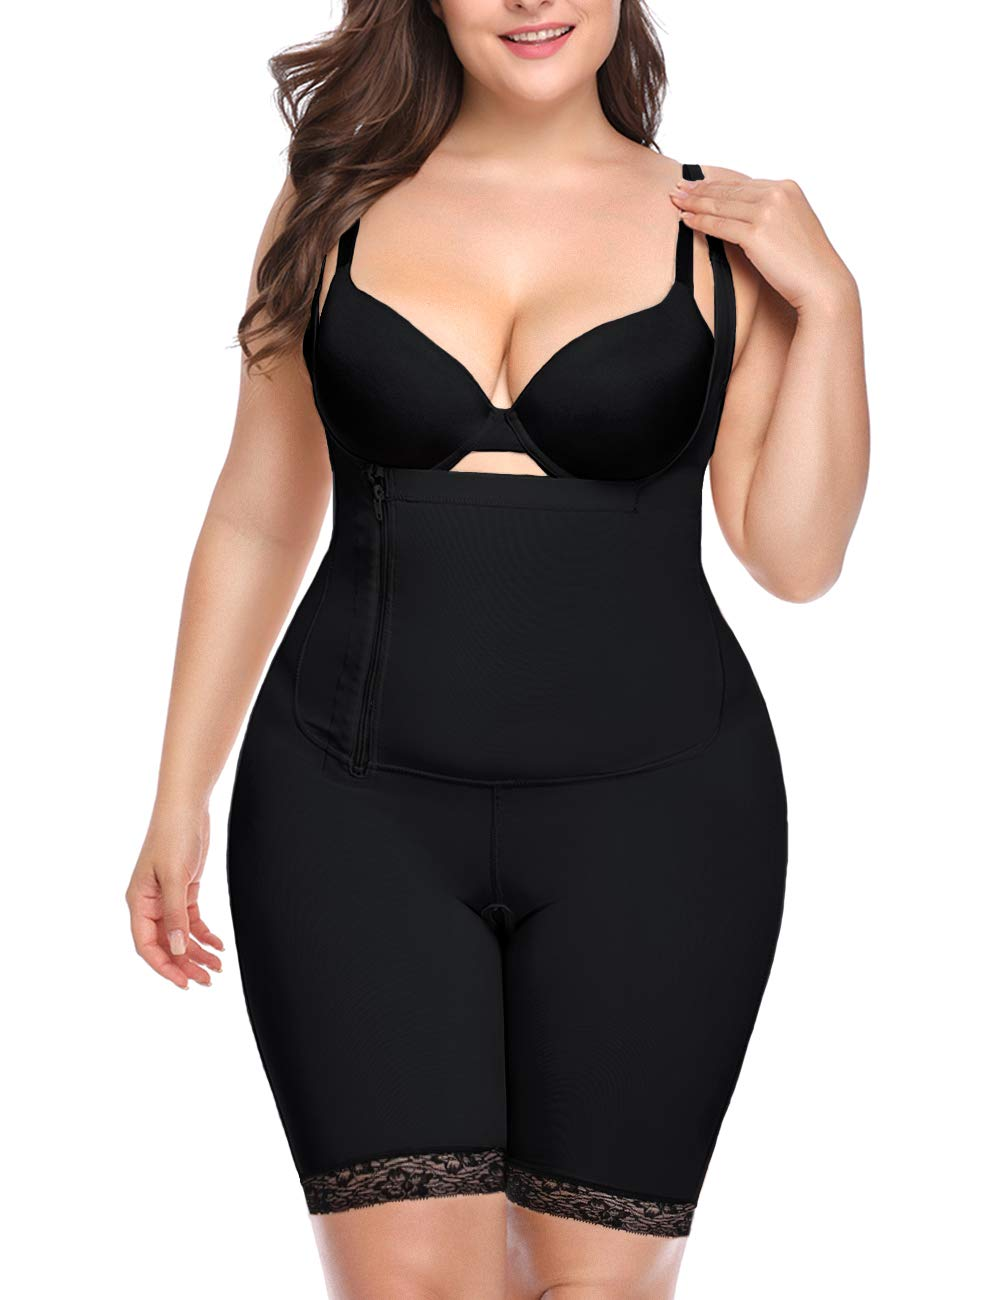 RIBIKA Womens Shapewear Tummy Control Bodysuit Slimming Seamless Full Body Shaper Corset